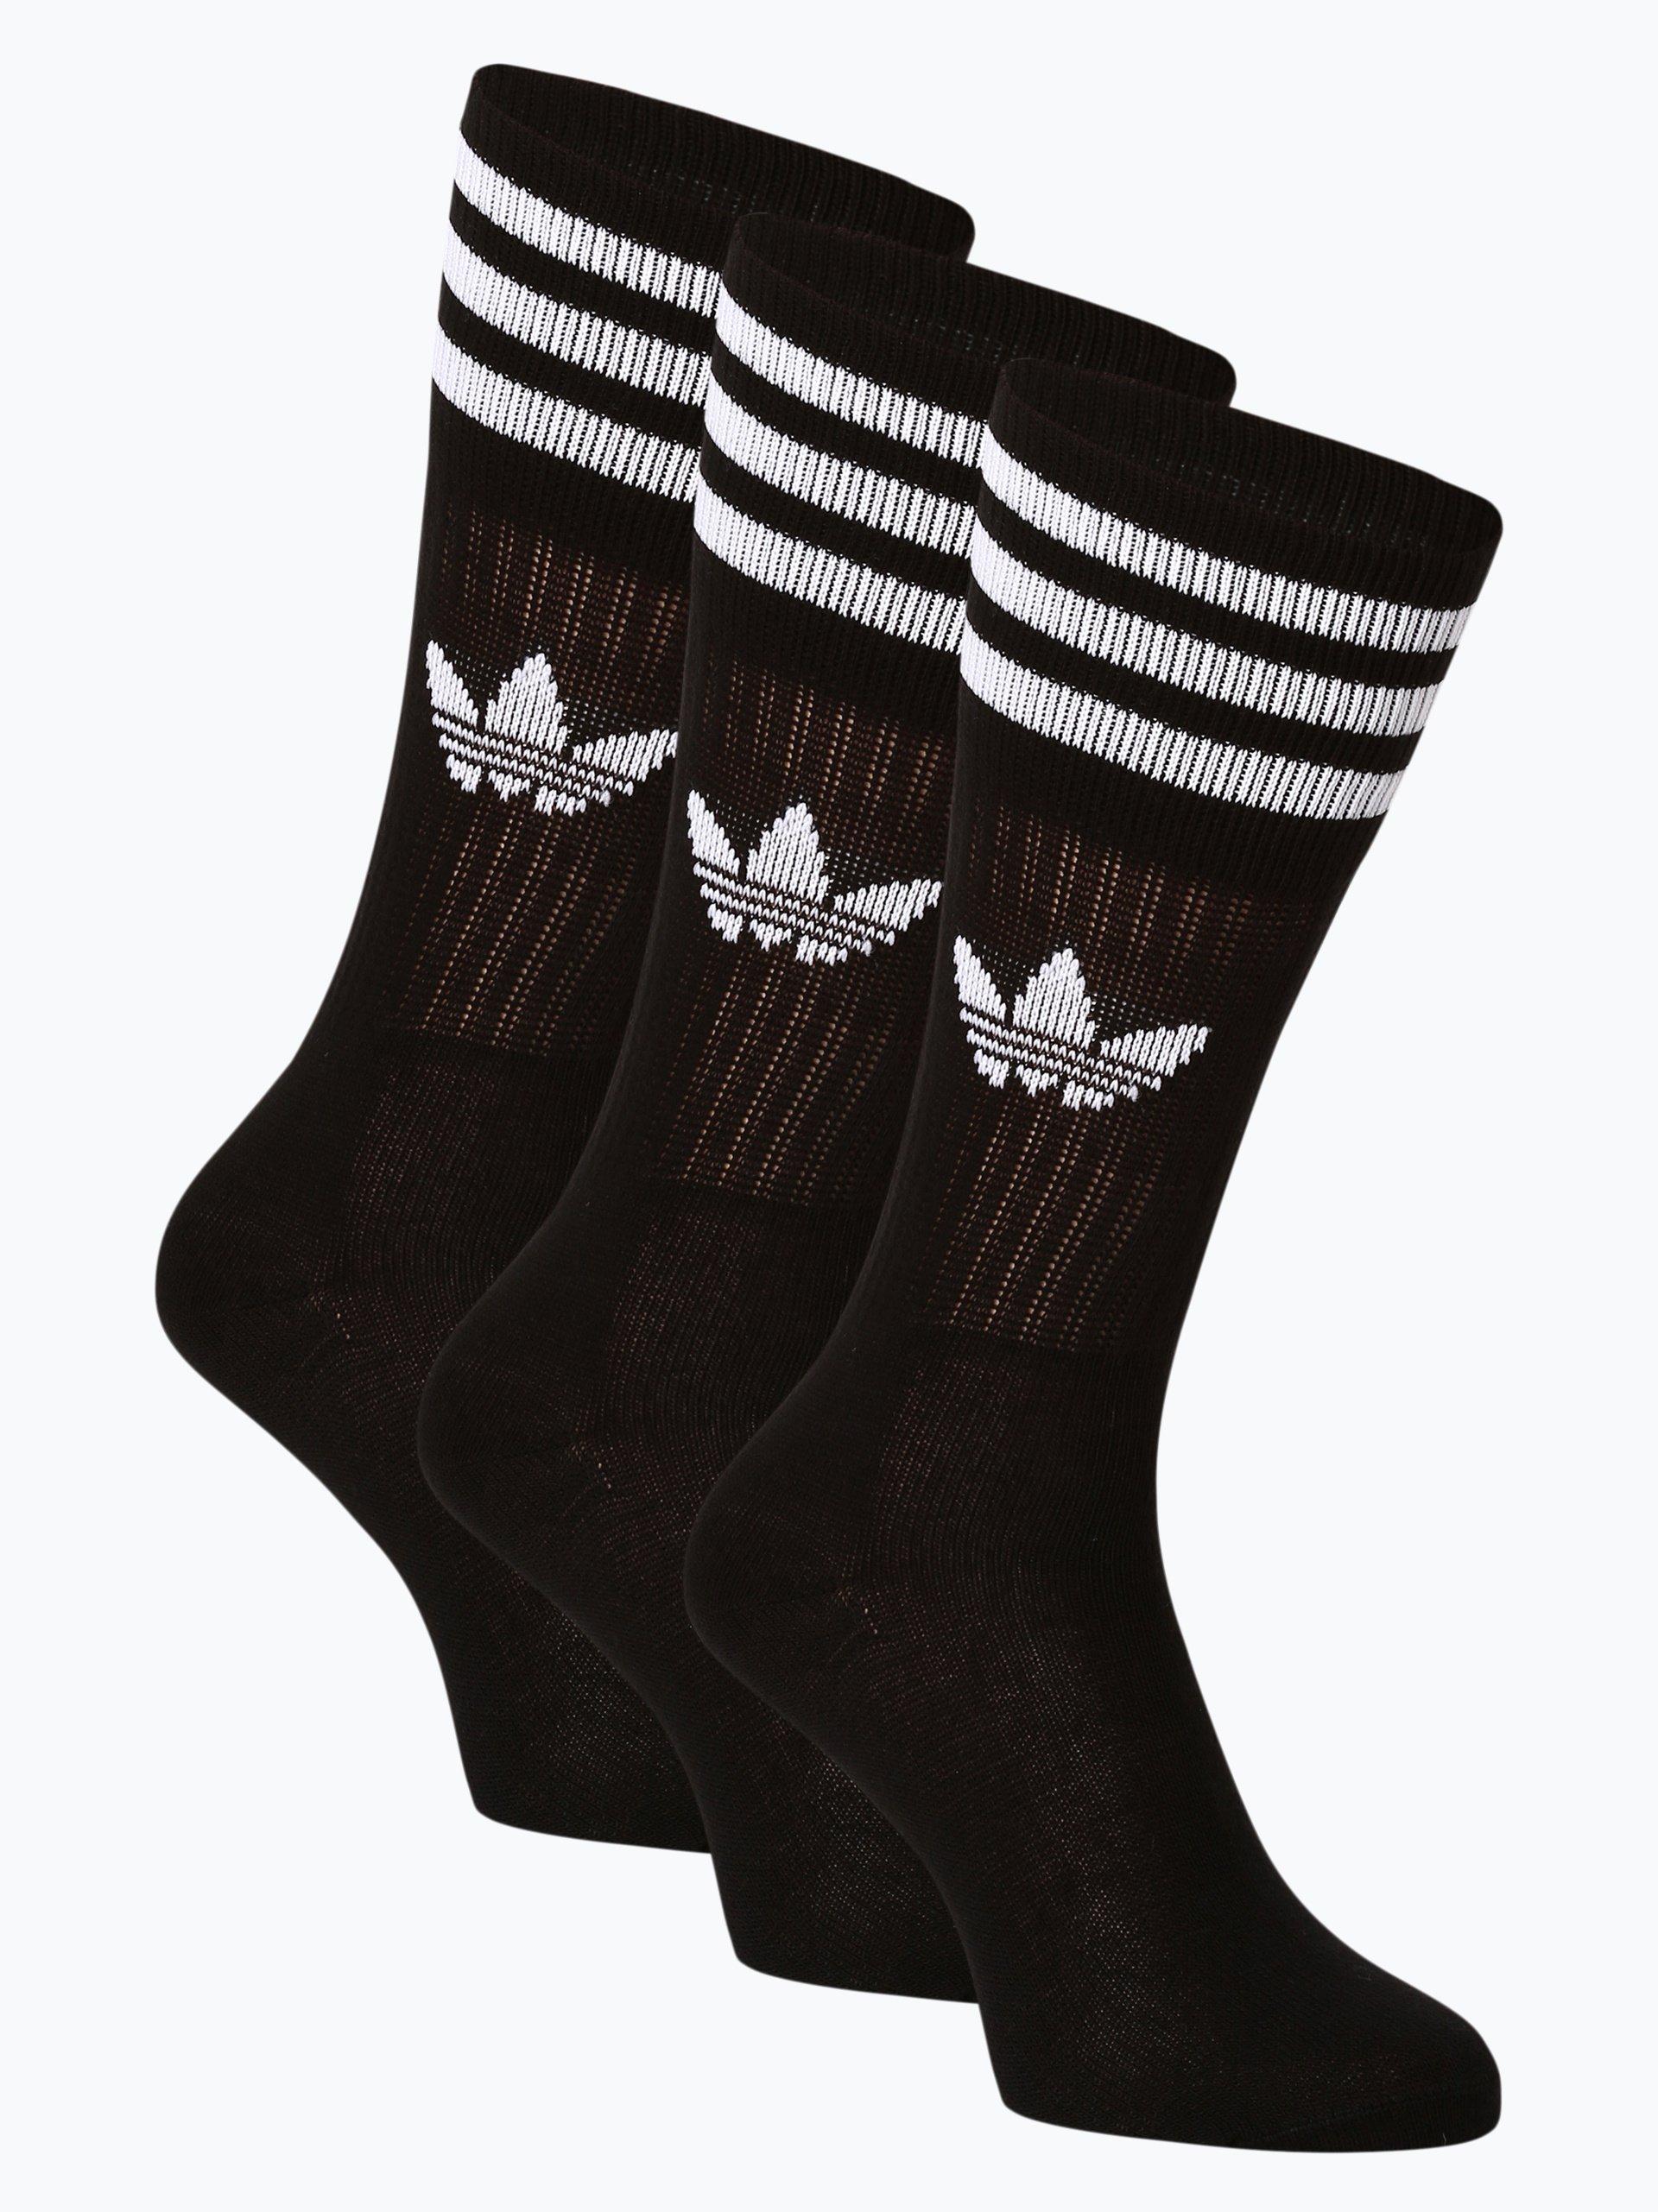 adidas Originals Skarpety damskie pakowane po 3 szt.